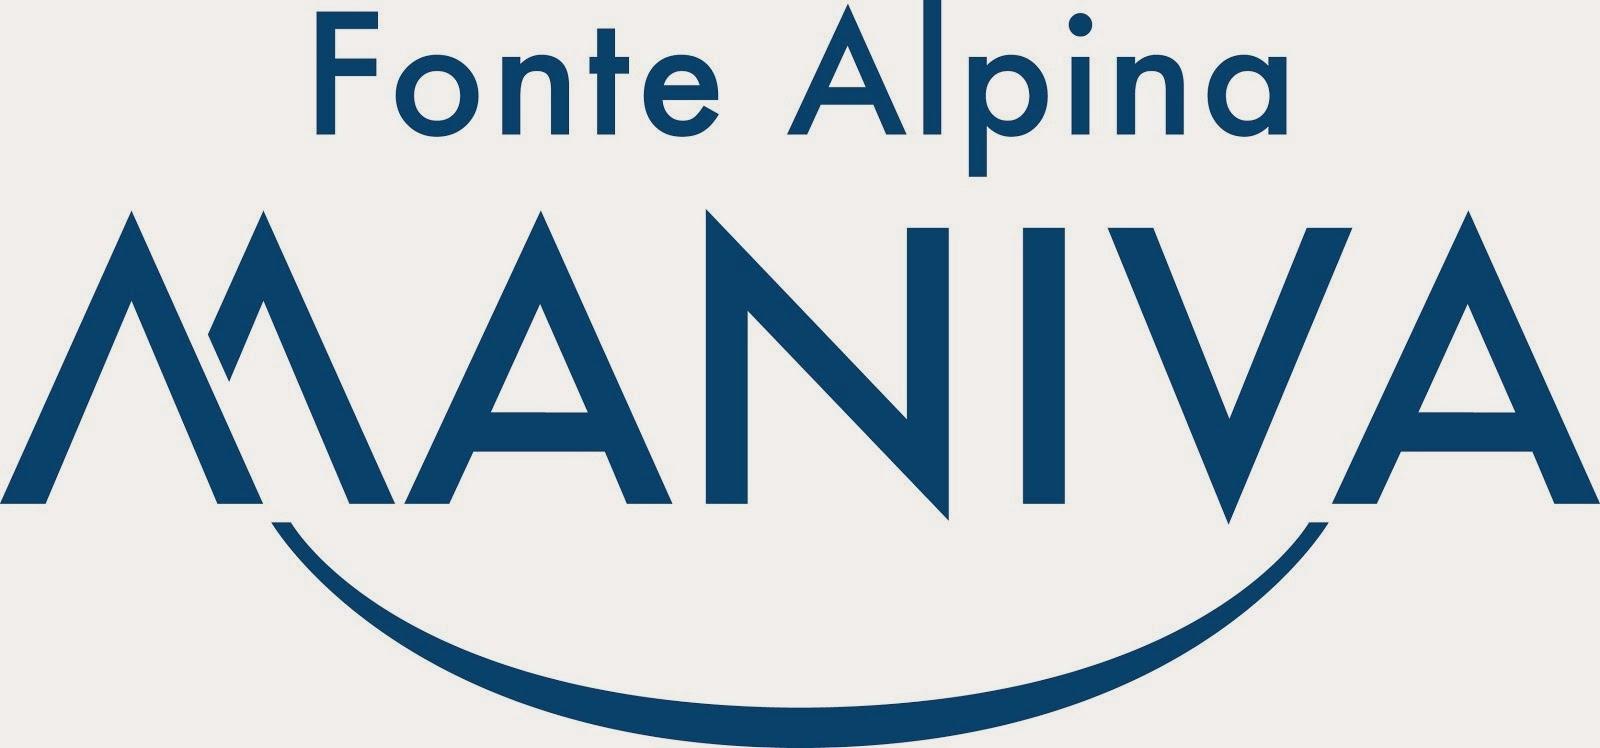 FONTE ALPINA MANIVA